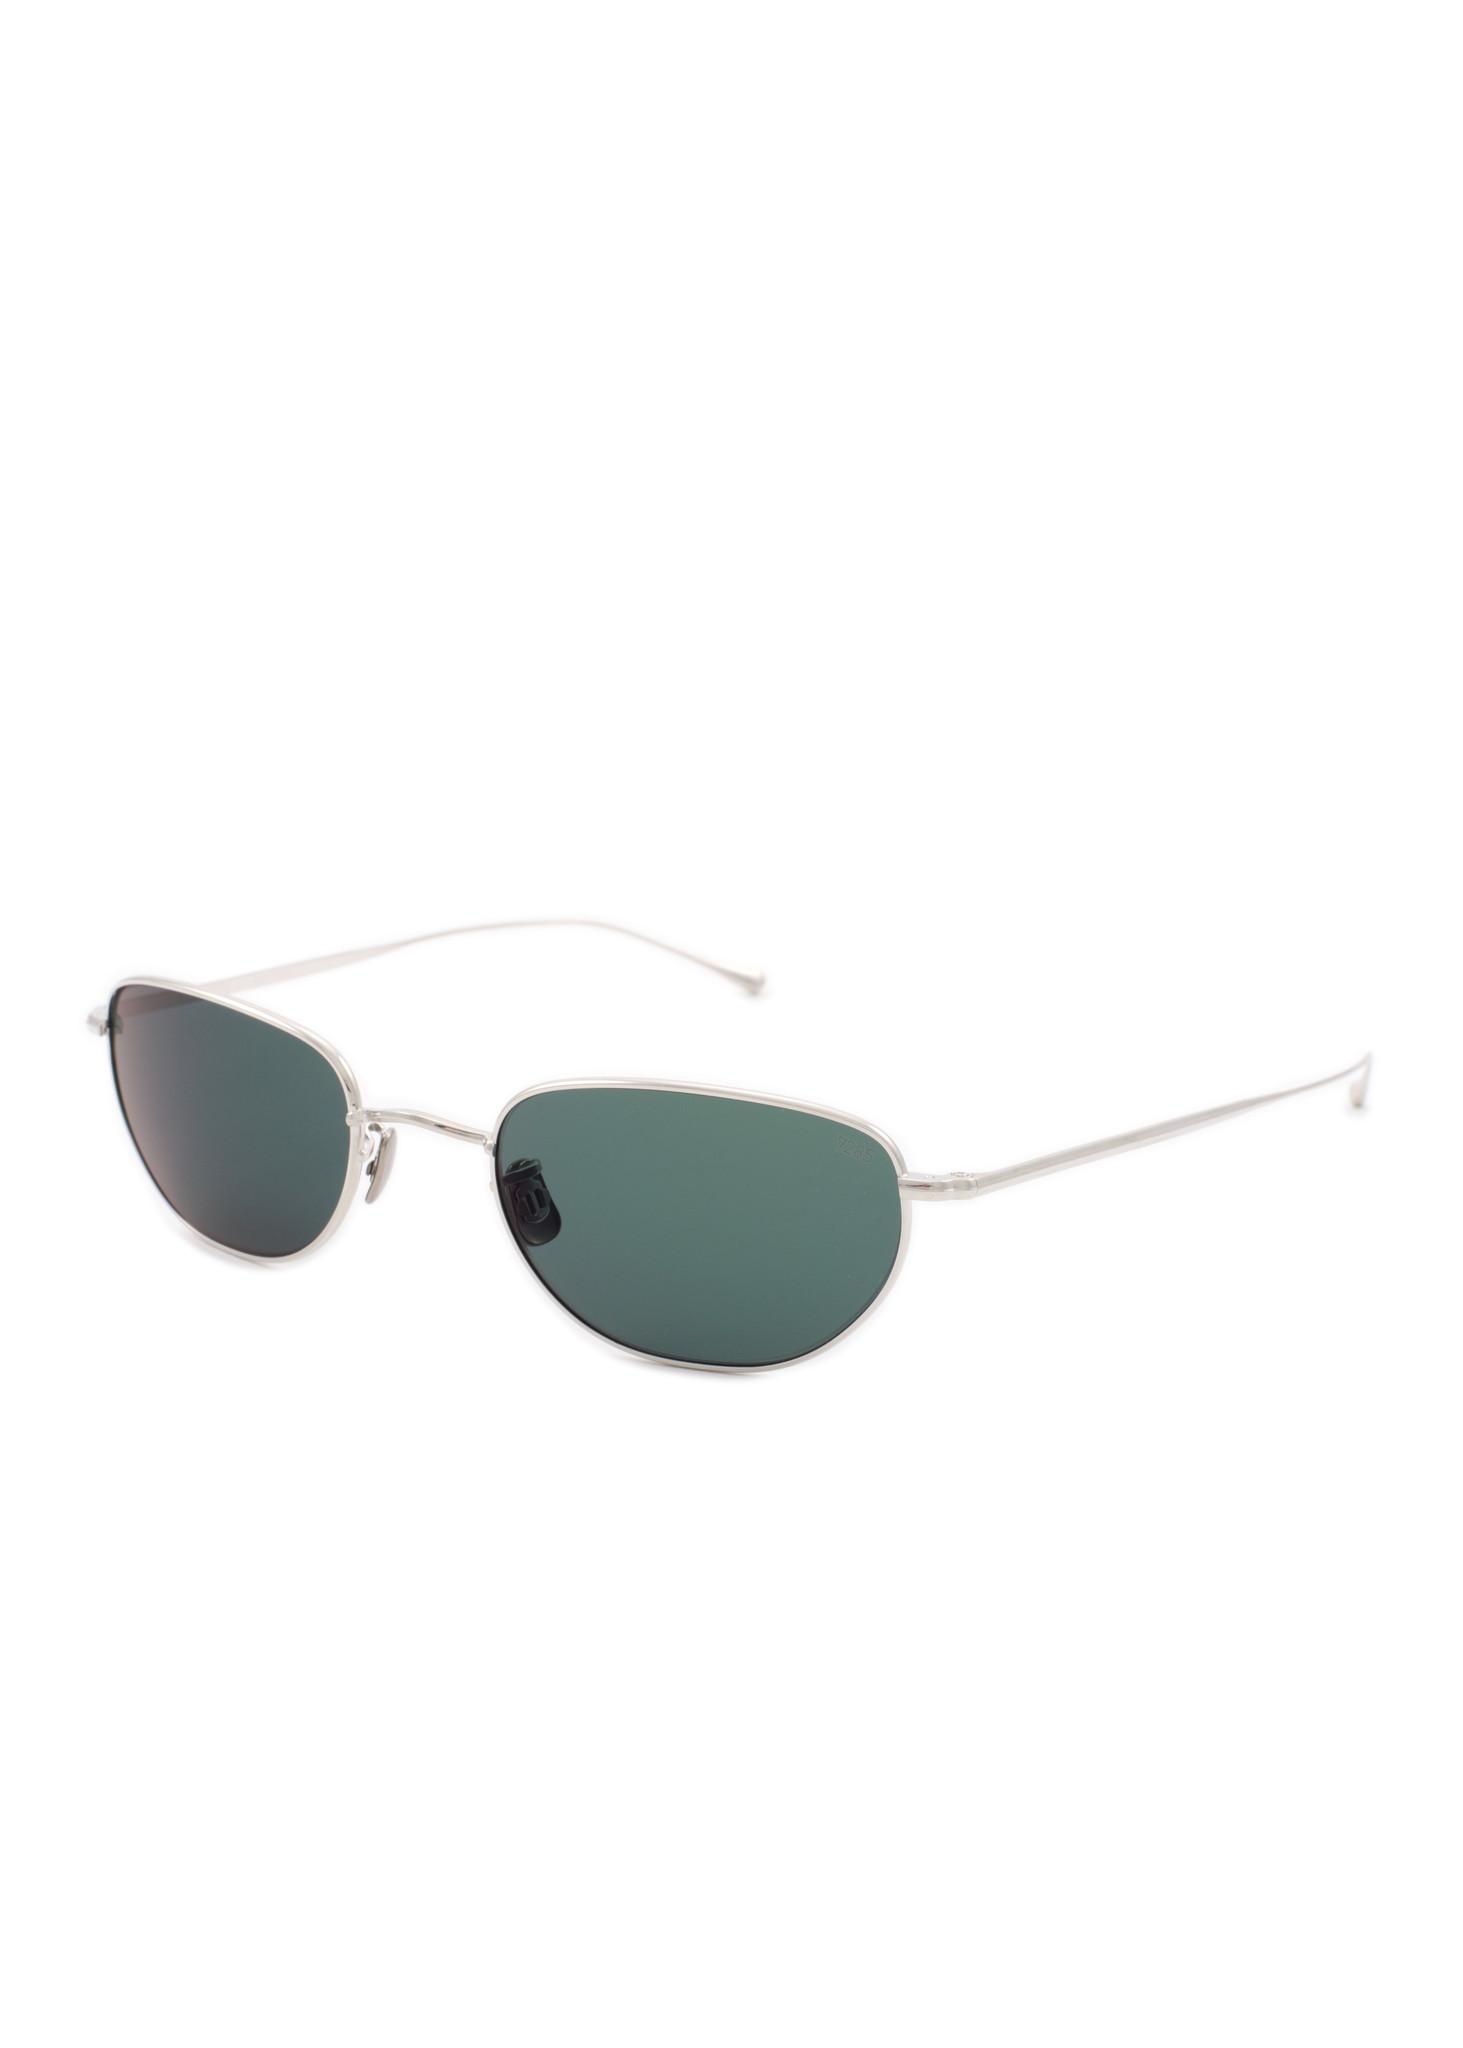 161(52) Sunglasses